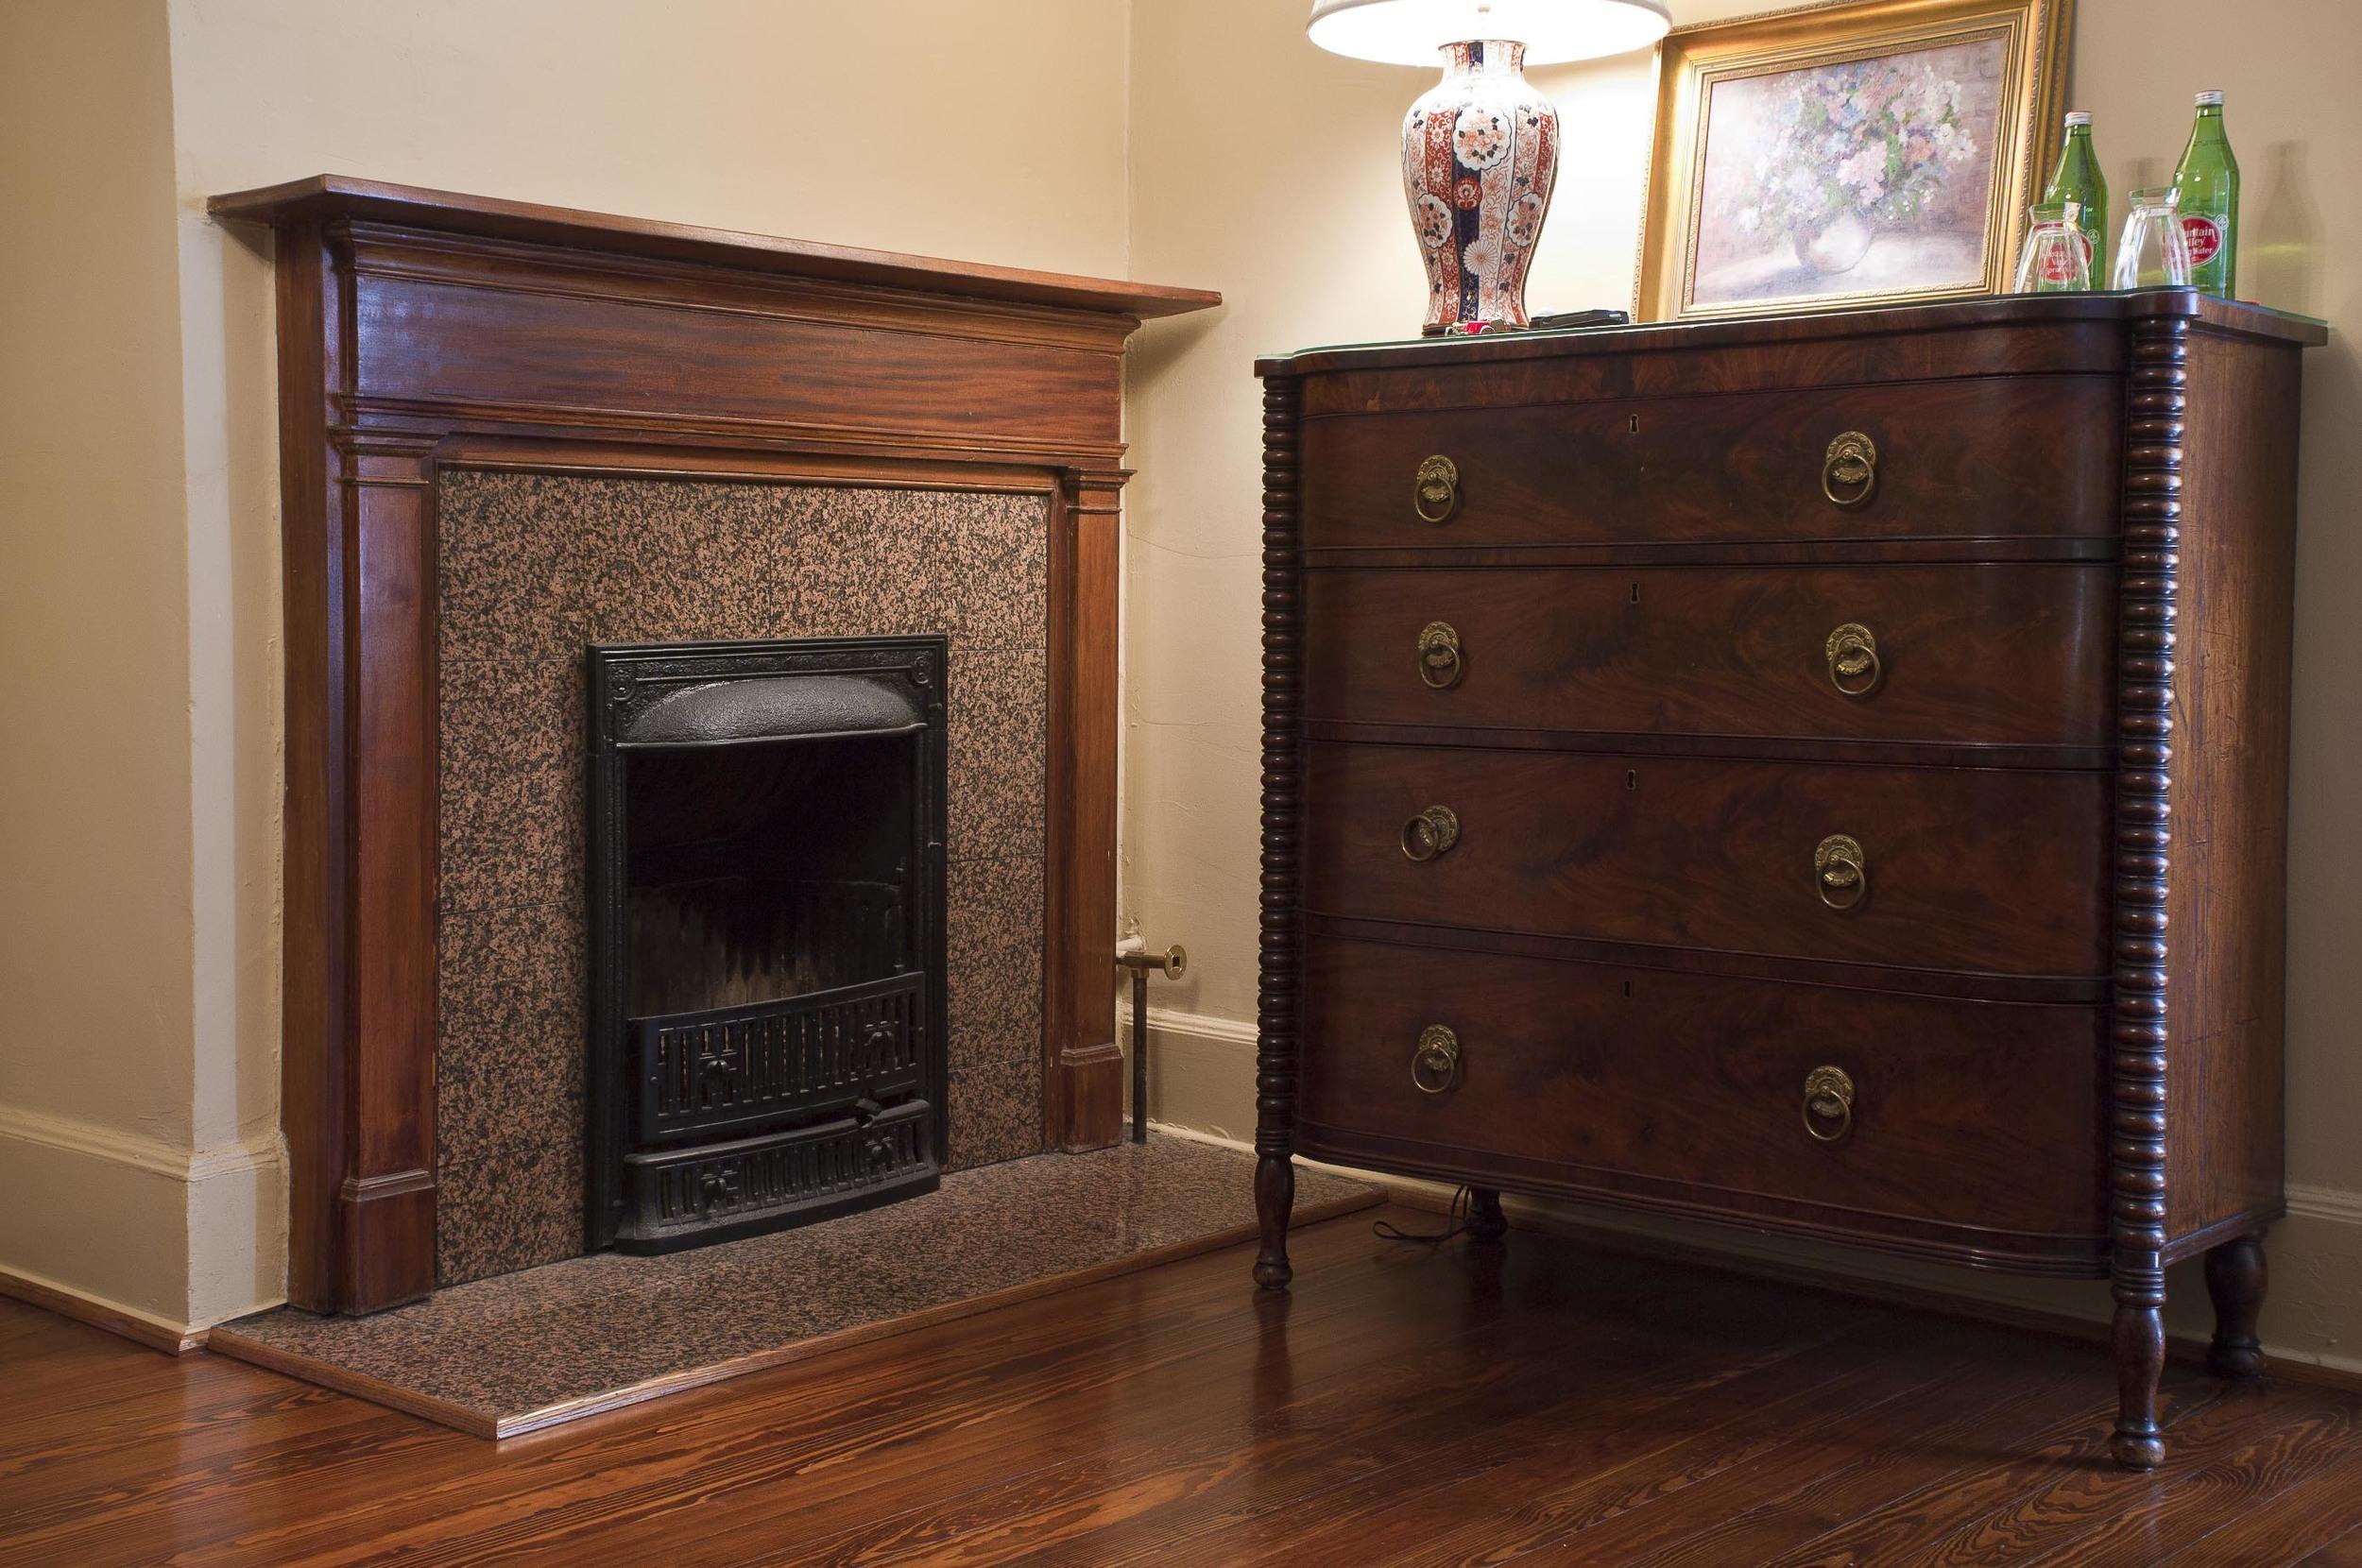 Daisy Room fireplace